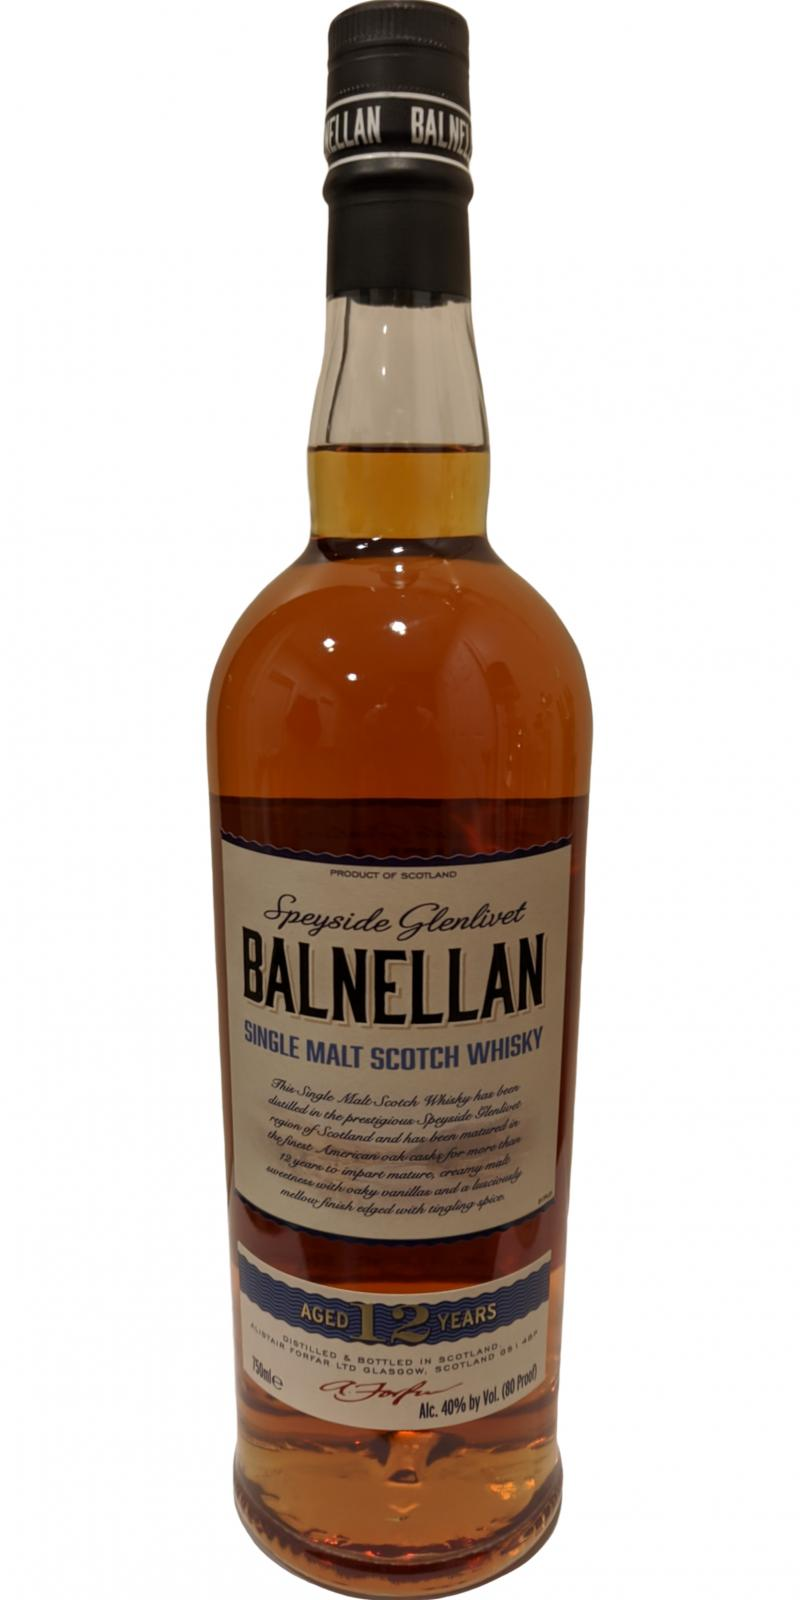 Balnellan 12-year-old